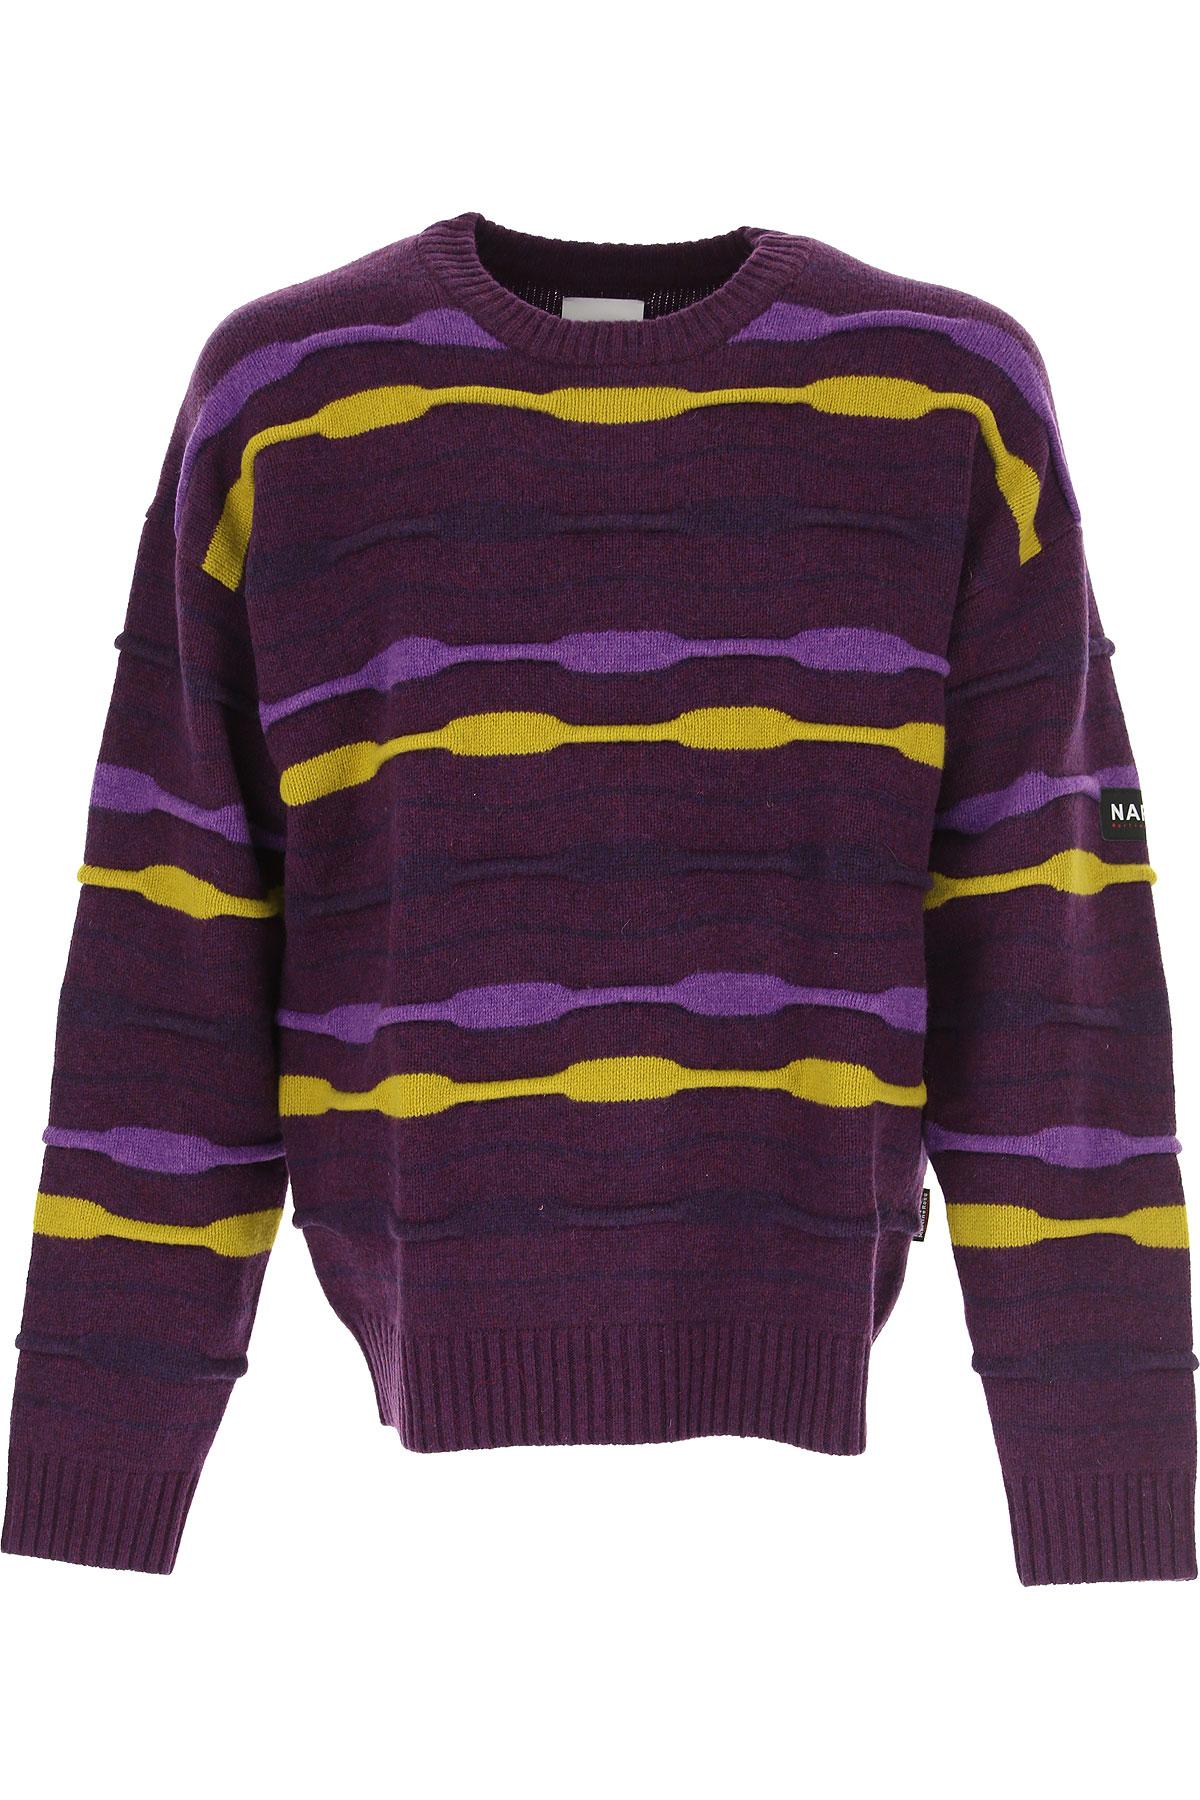 Napapijri Sweater for Men Jumper On Sale, Purple, Wool, 2019, L M